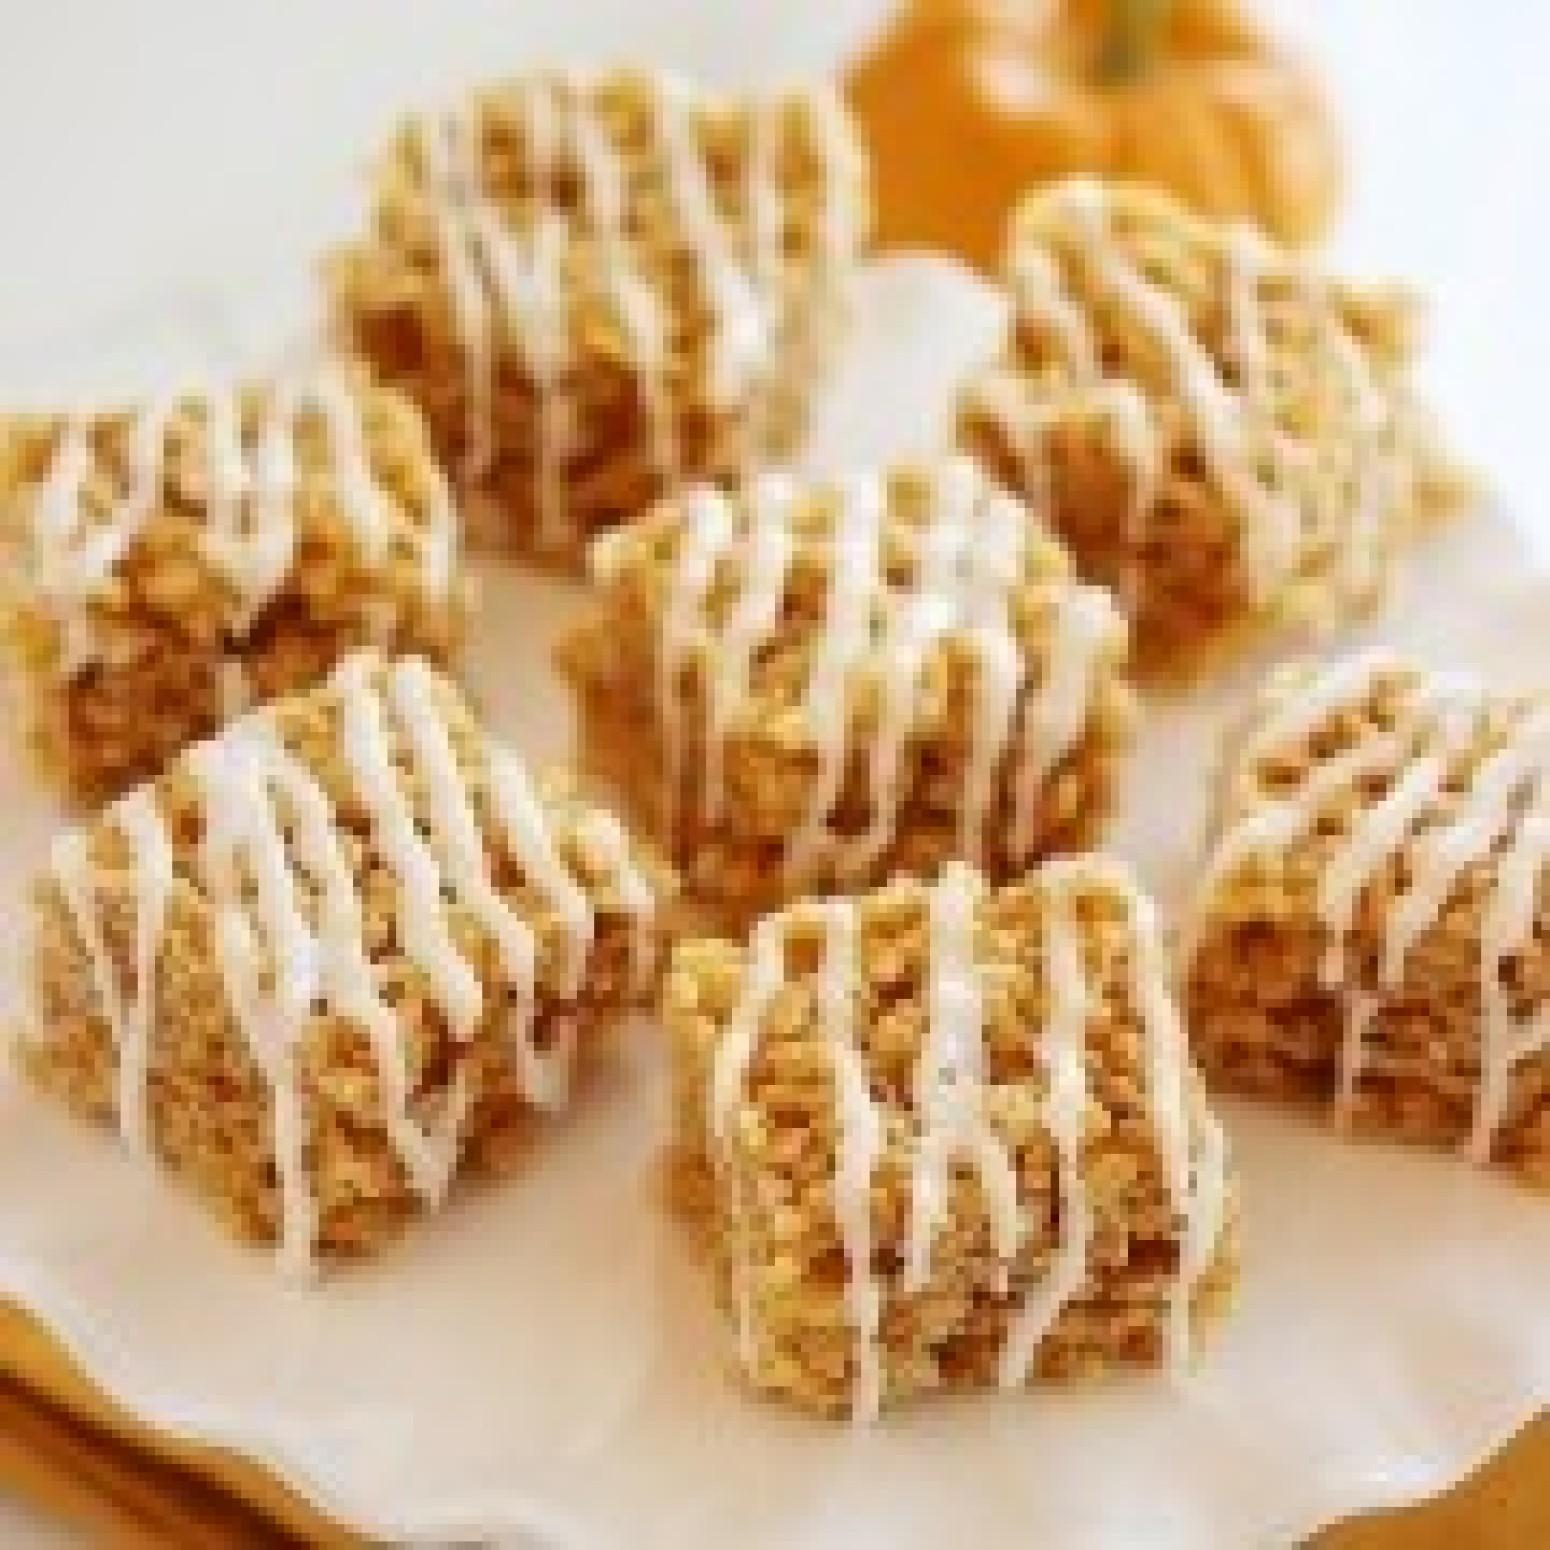 Pumpkin Spice Rice Krispie Treats Recipe 3 | Just A Pinch Recipes